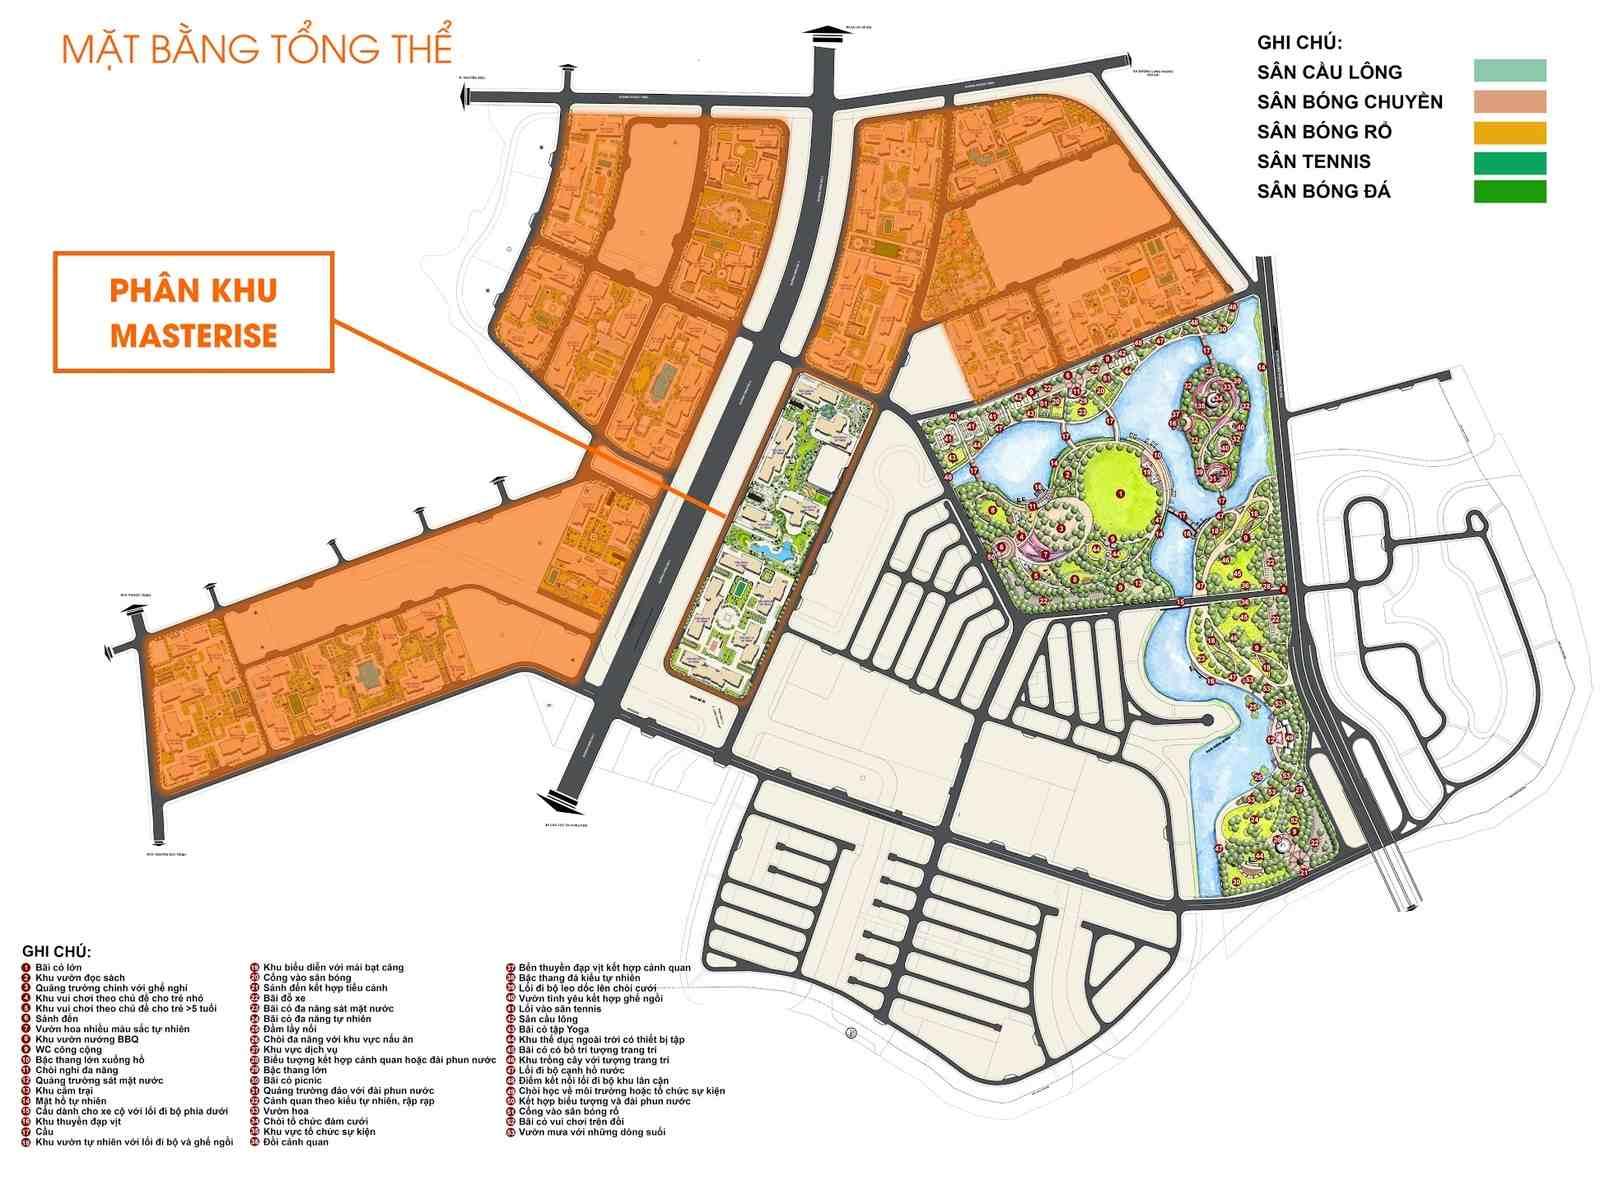 Masterise Homes Masteri Centre Point Marina Central - Masterise Grand Park Quận 9 - Mặt bằng